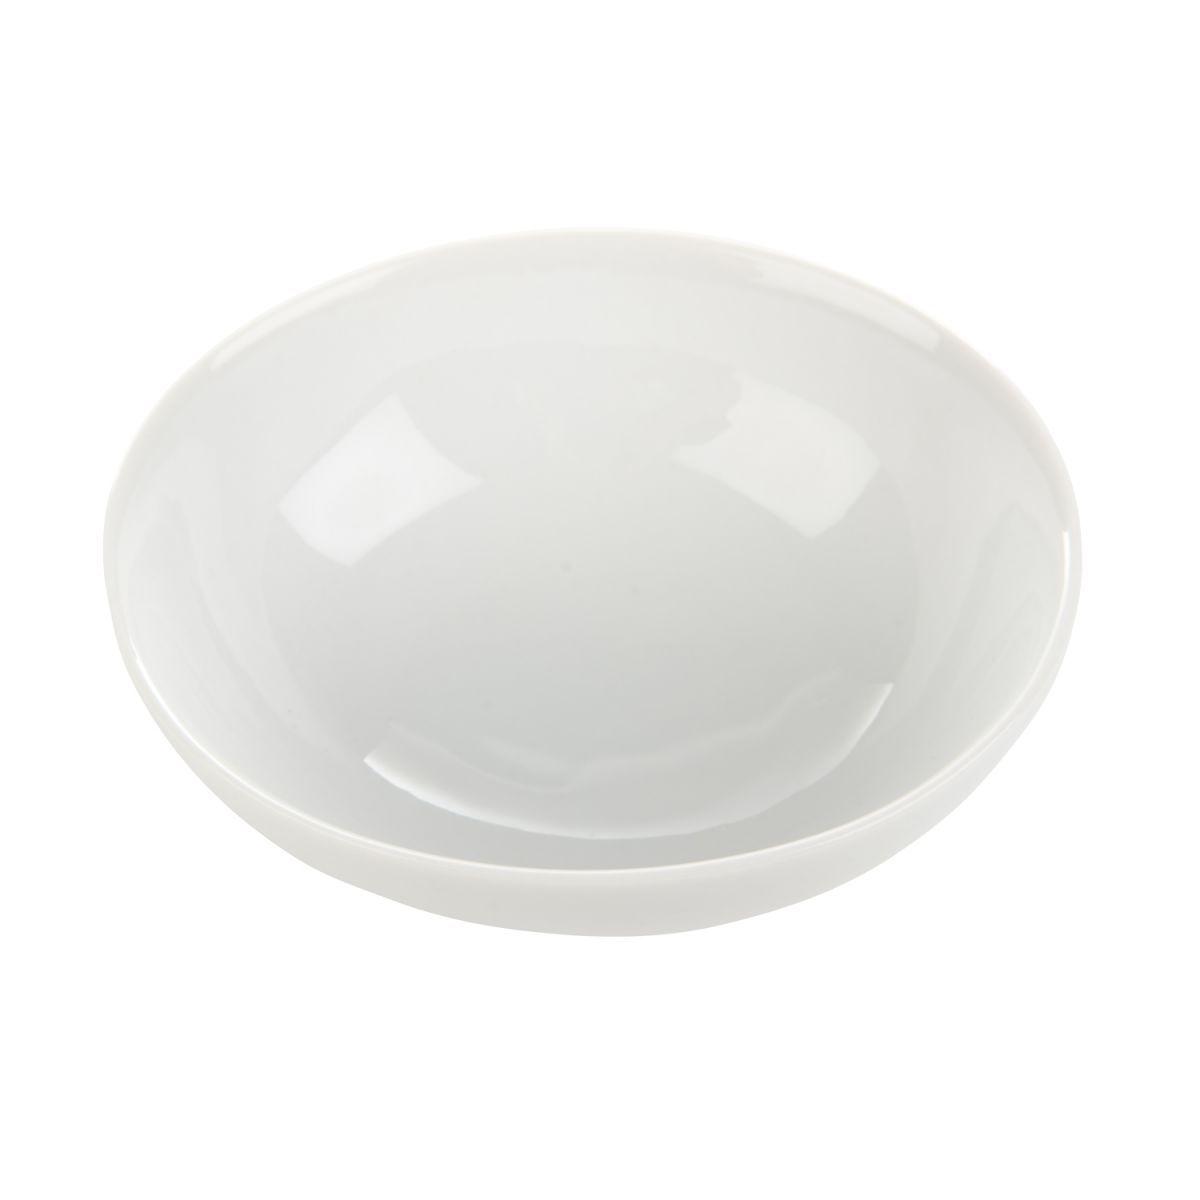 bowl oval 11x10 porcelain box6